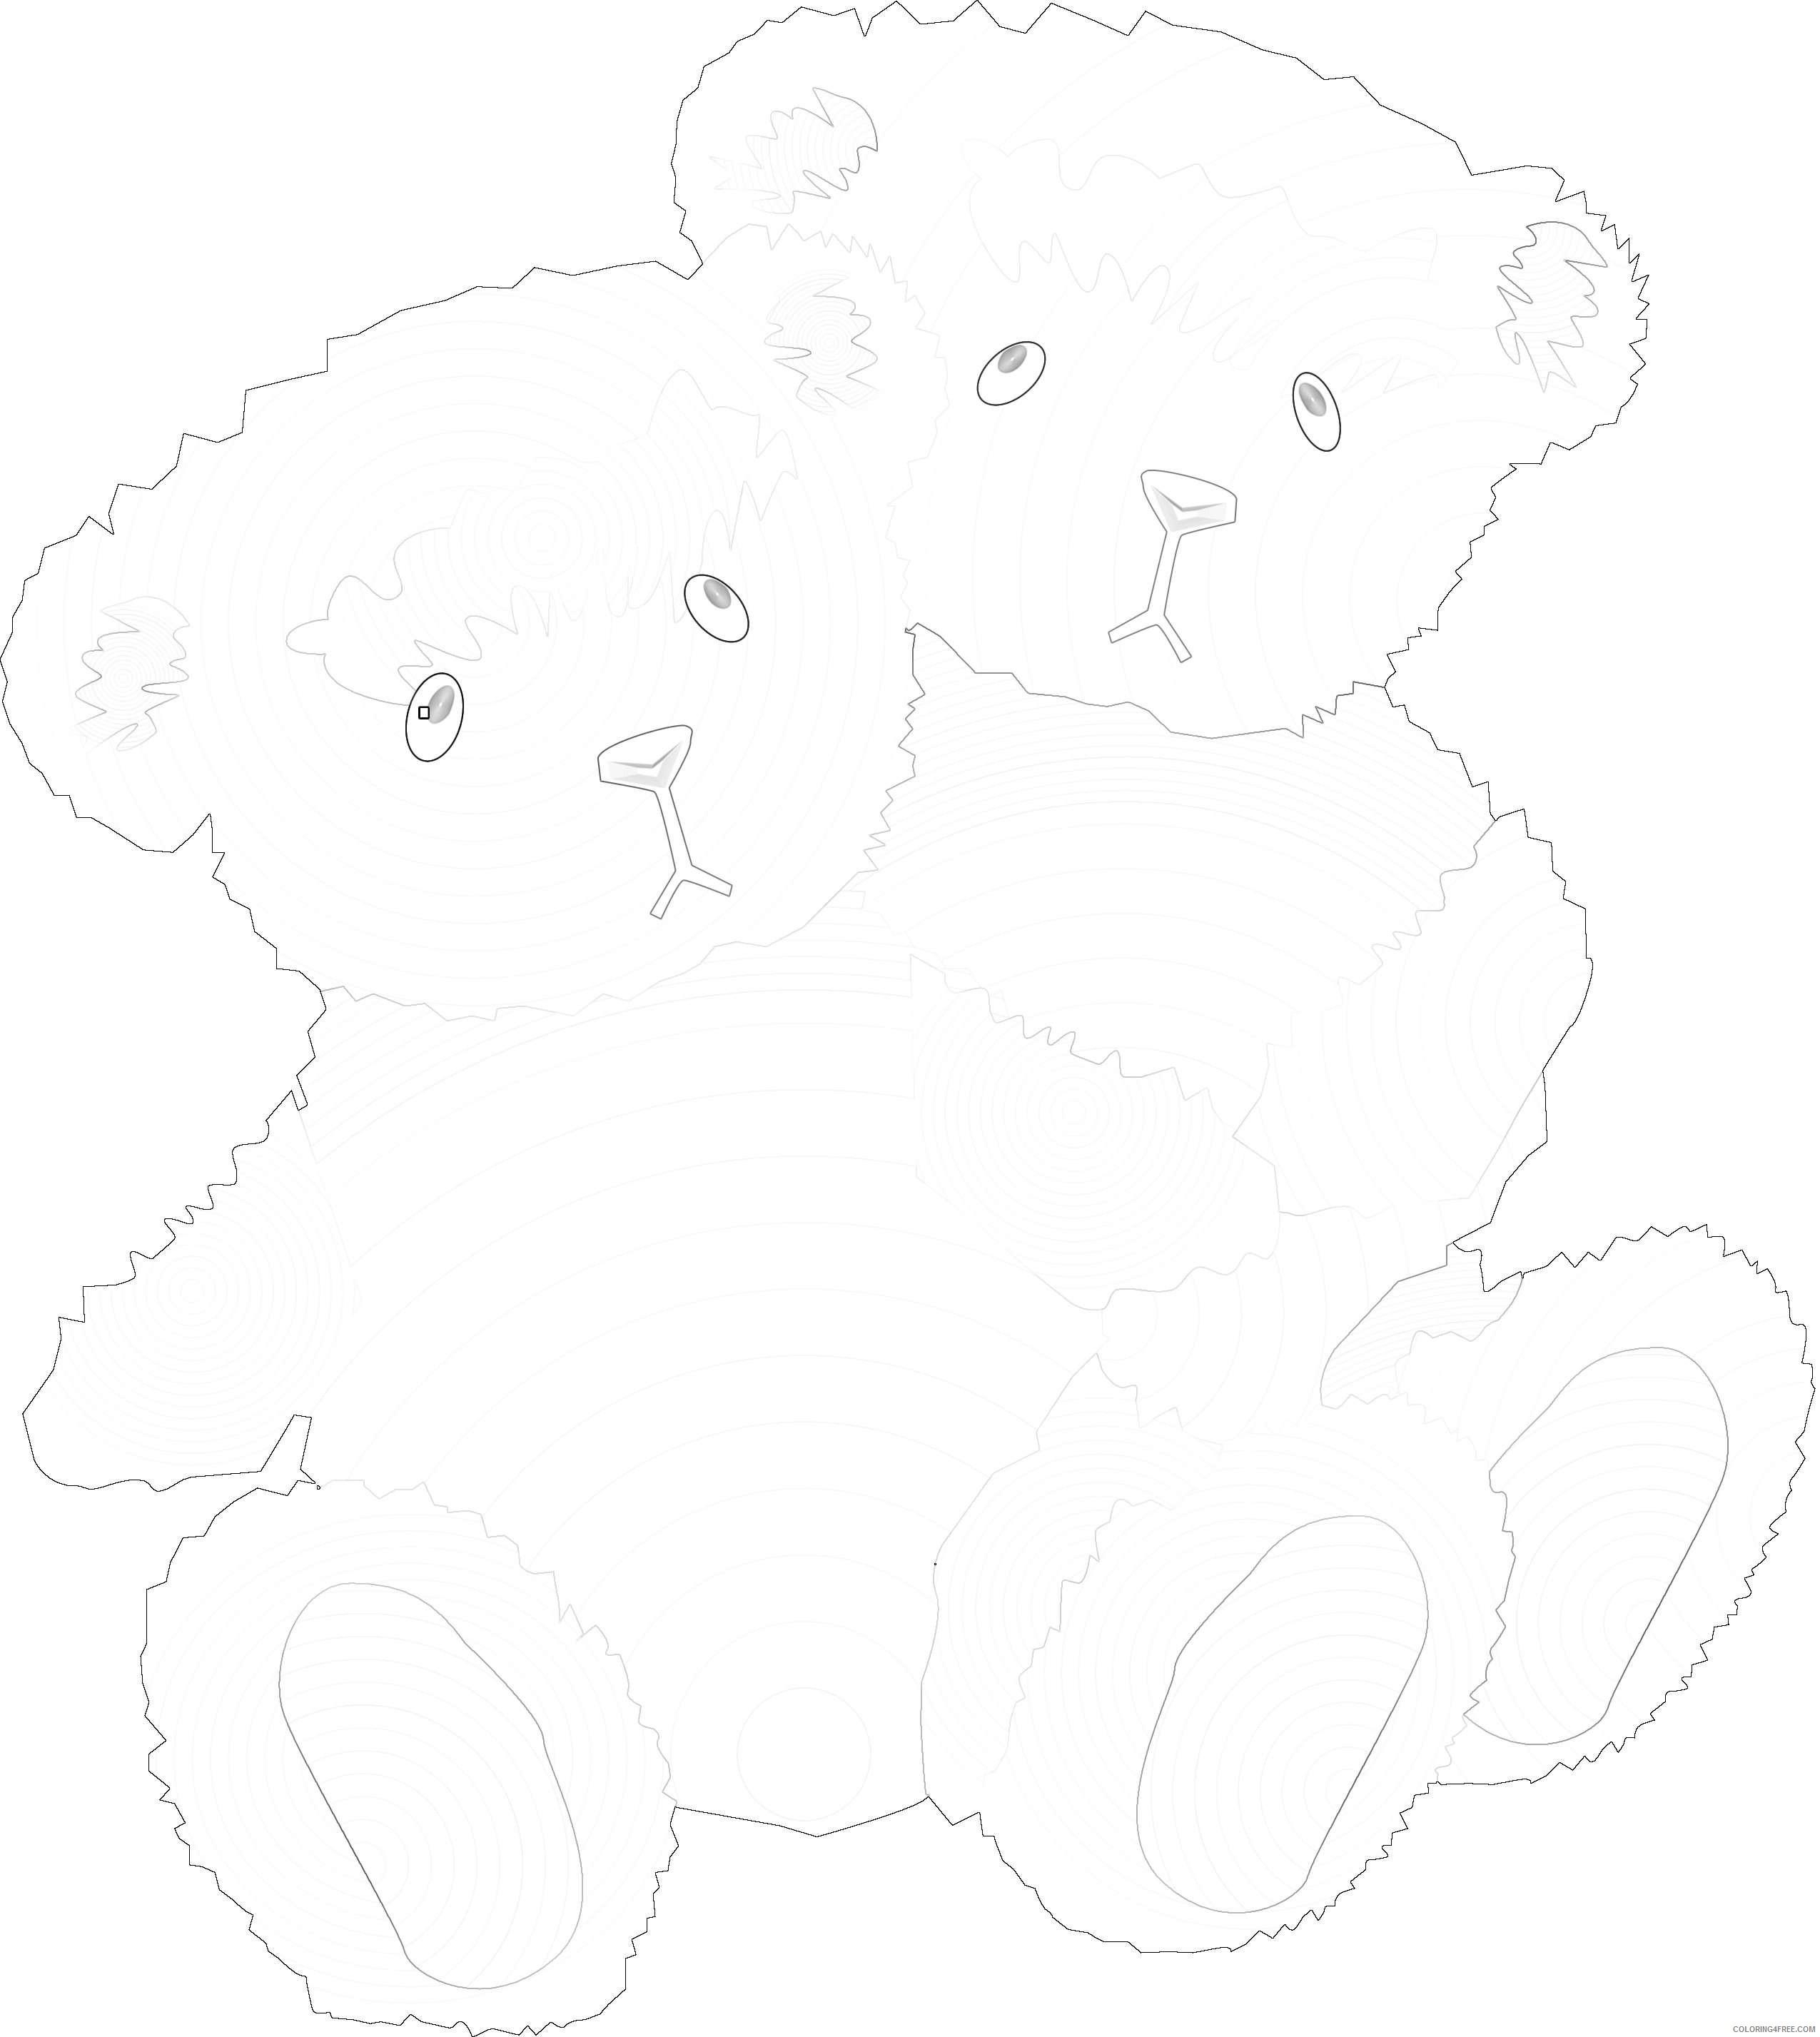 bear hug bear hug bears n1Mu2B coloring